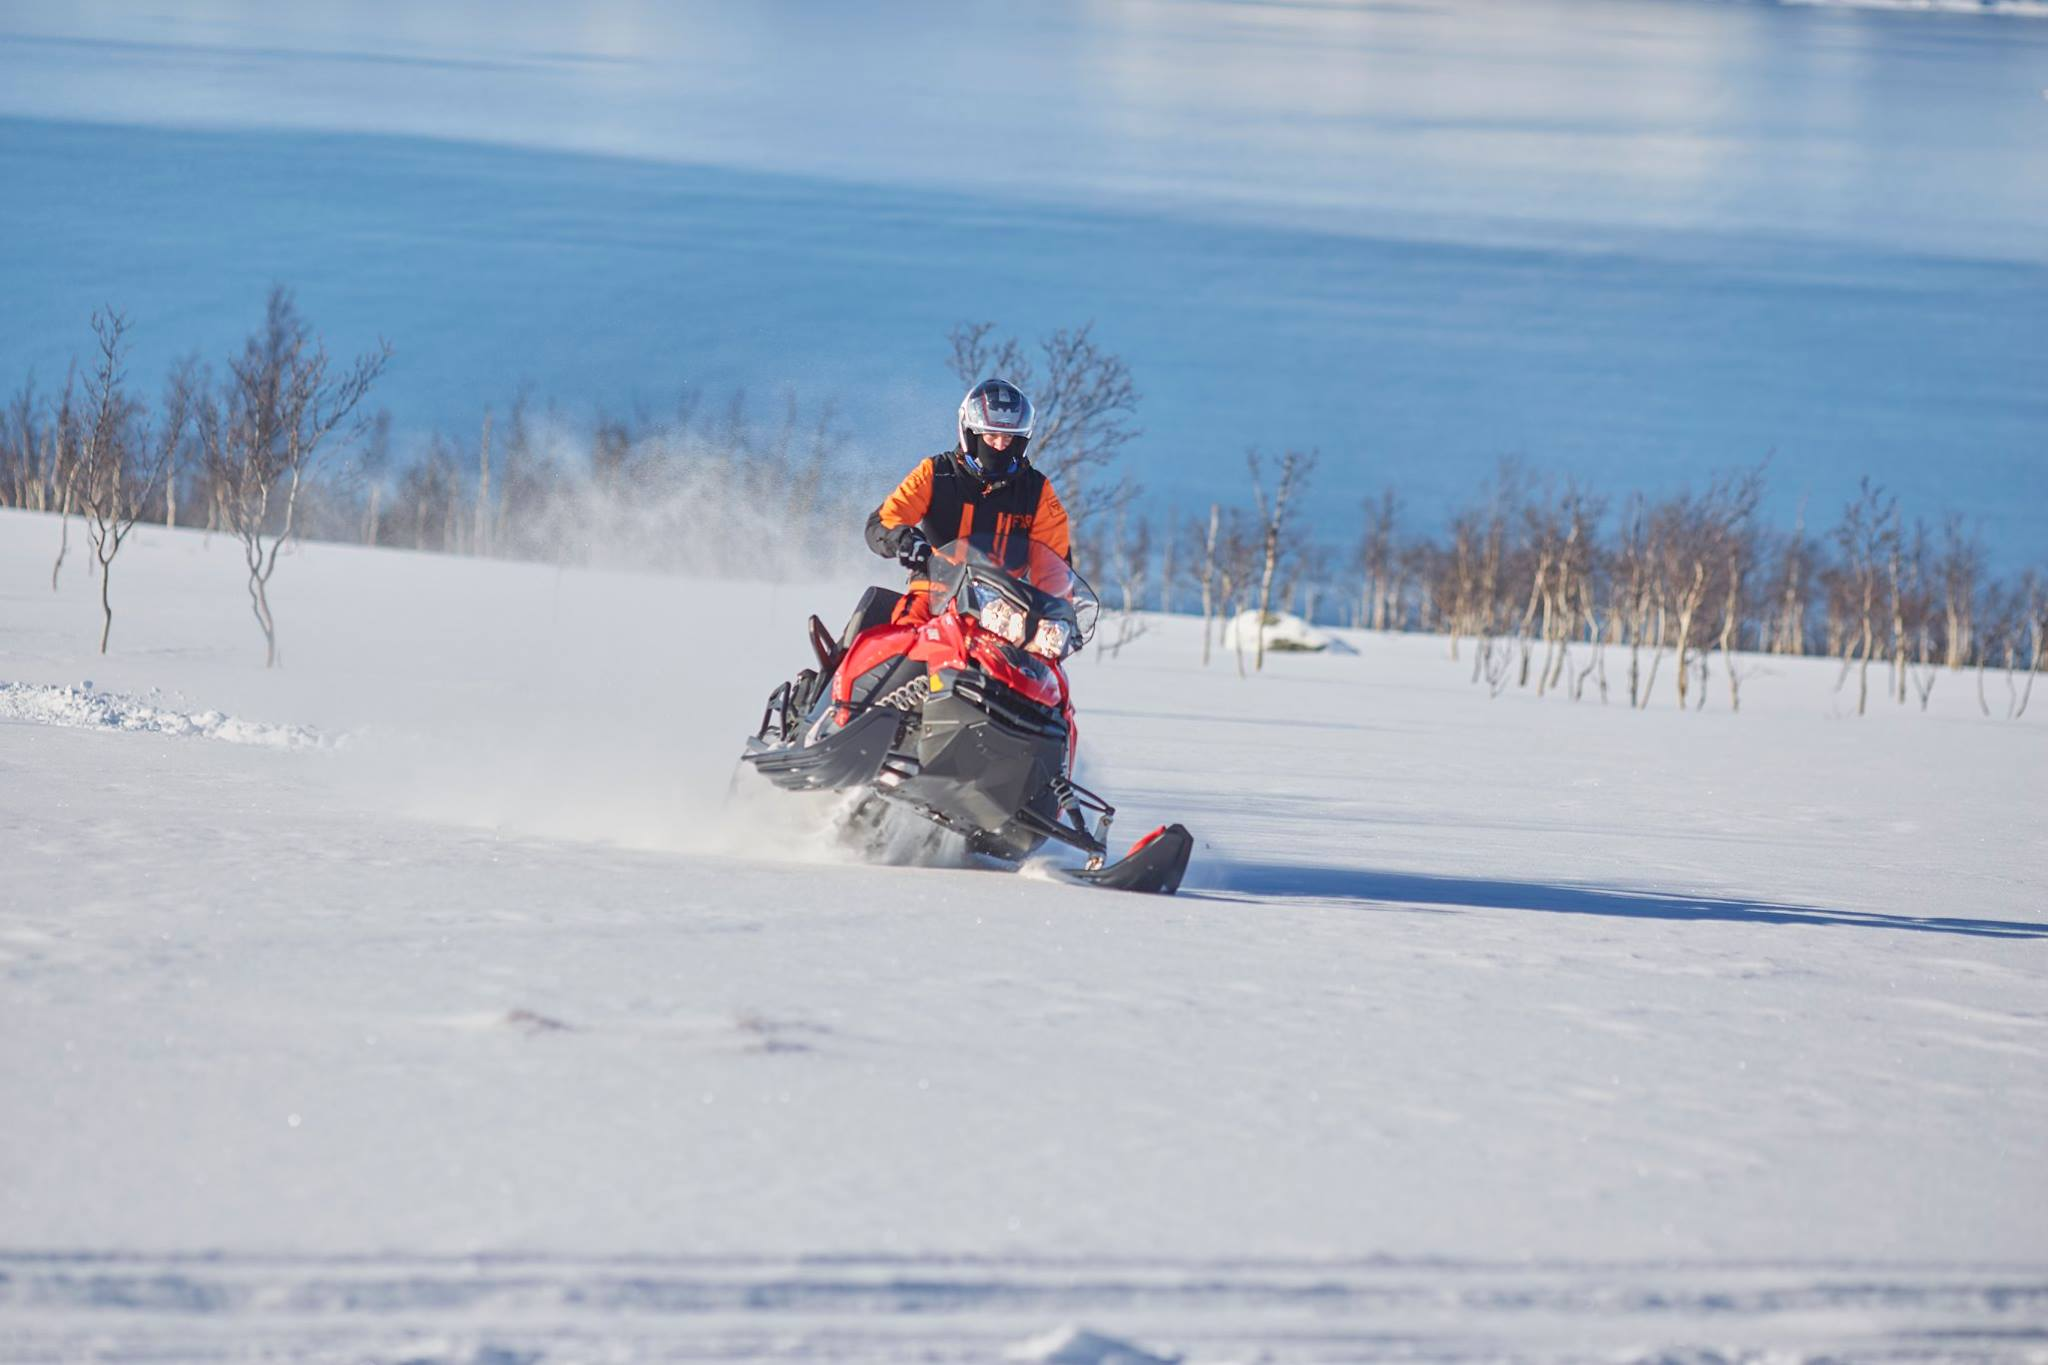 Snowmobile Arctic Cruise In Norway 1.jpg